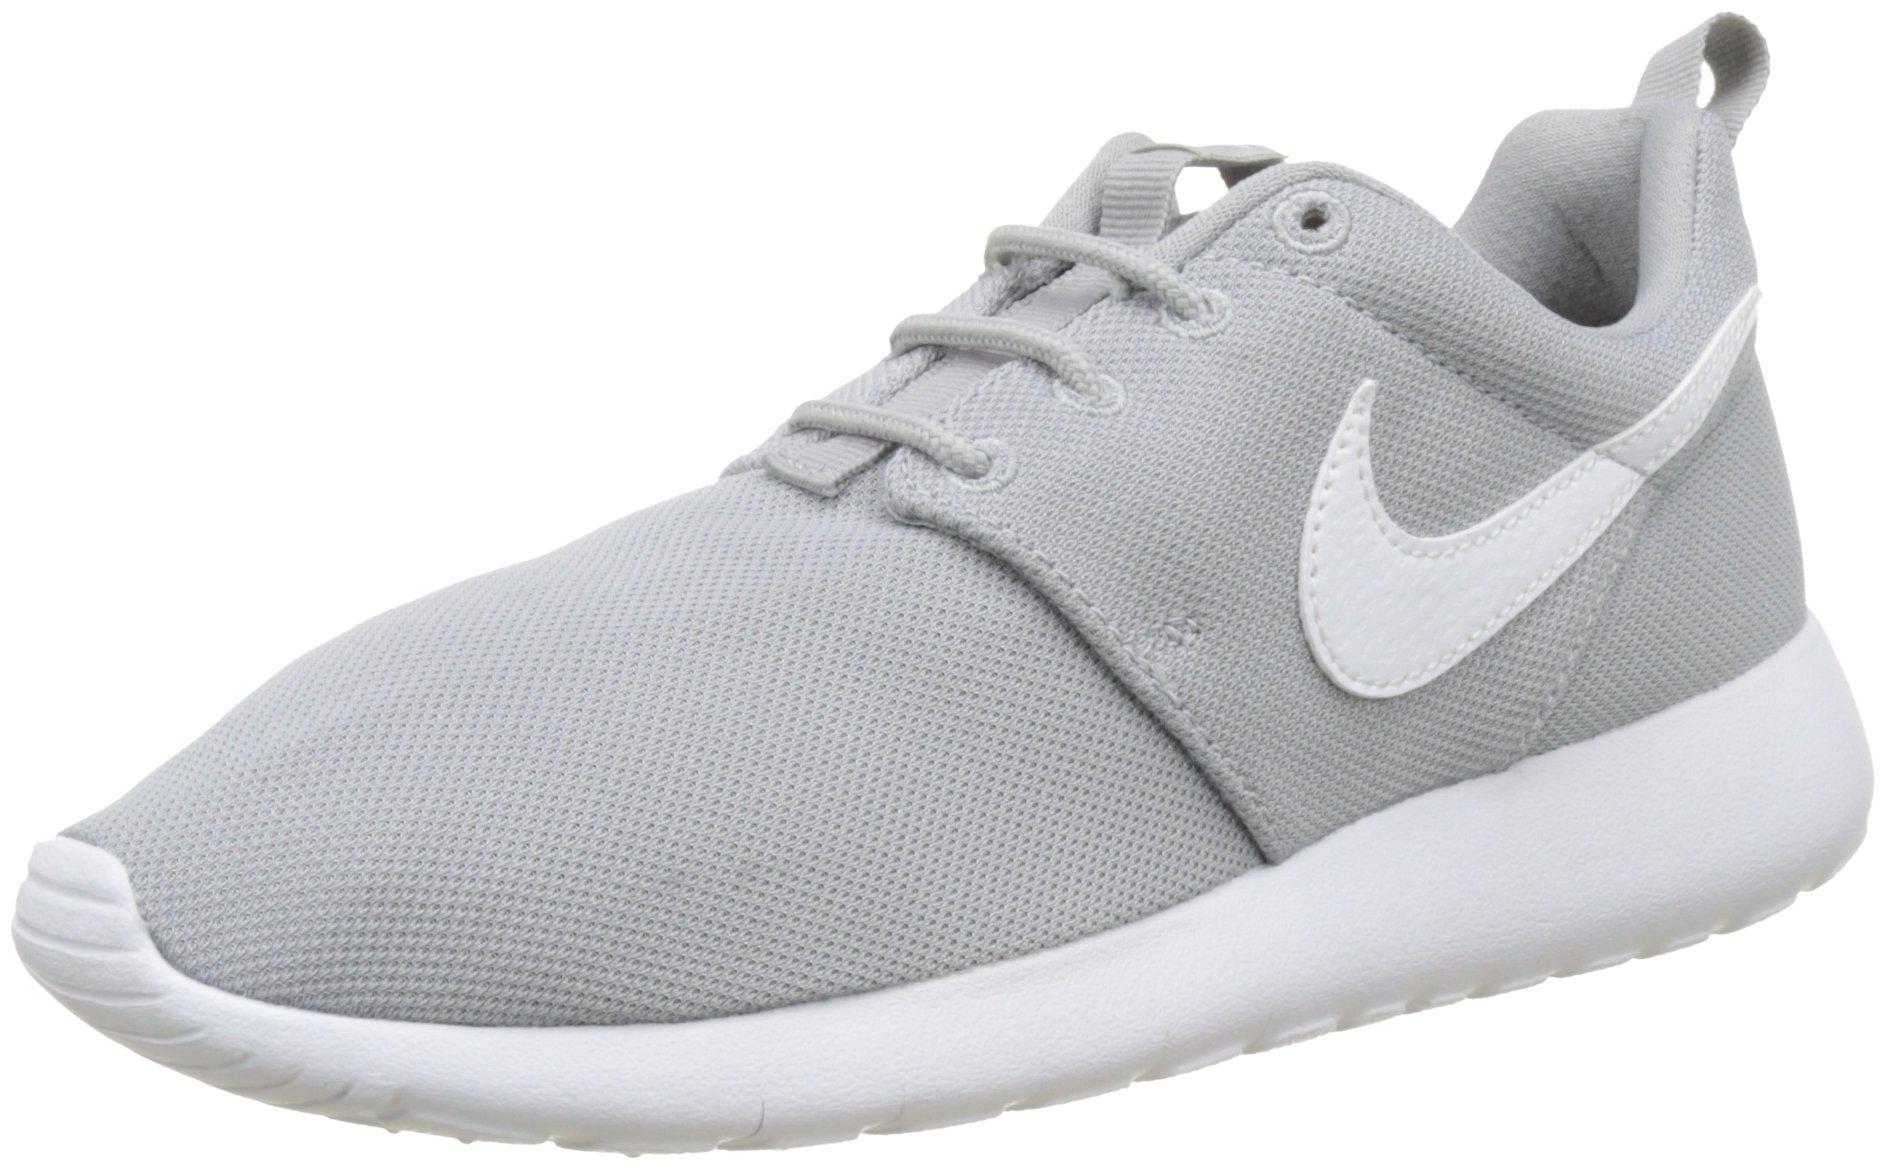 Nike Boy's Grade-School Roshe (GS) Sneakers Grey White Size 3.5Y US by NIKE